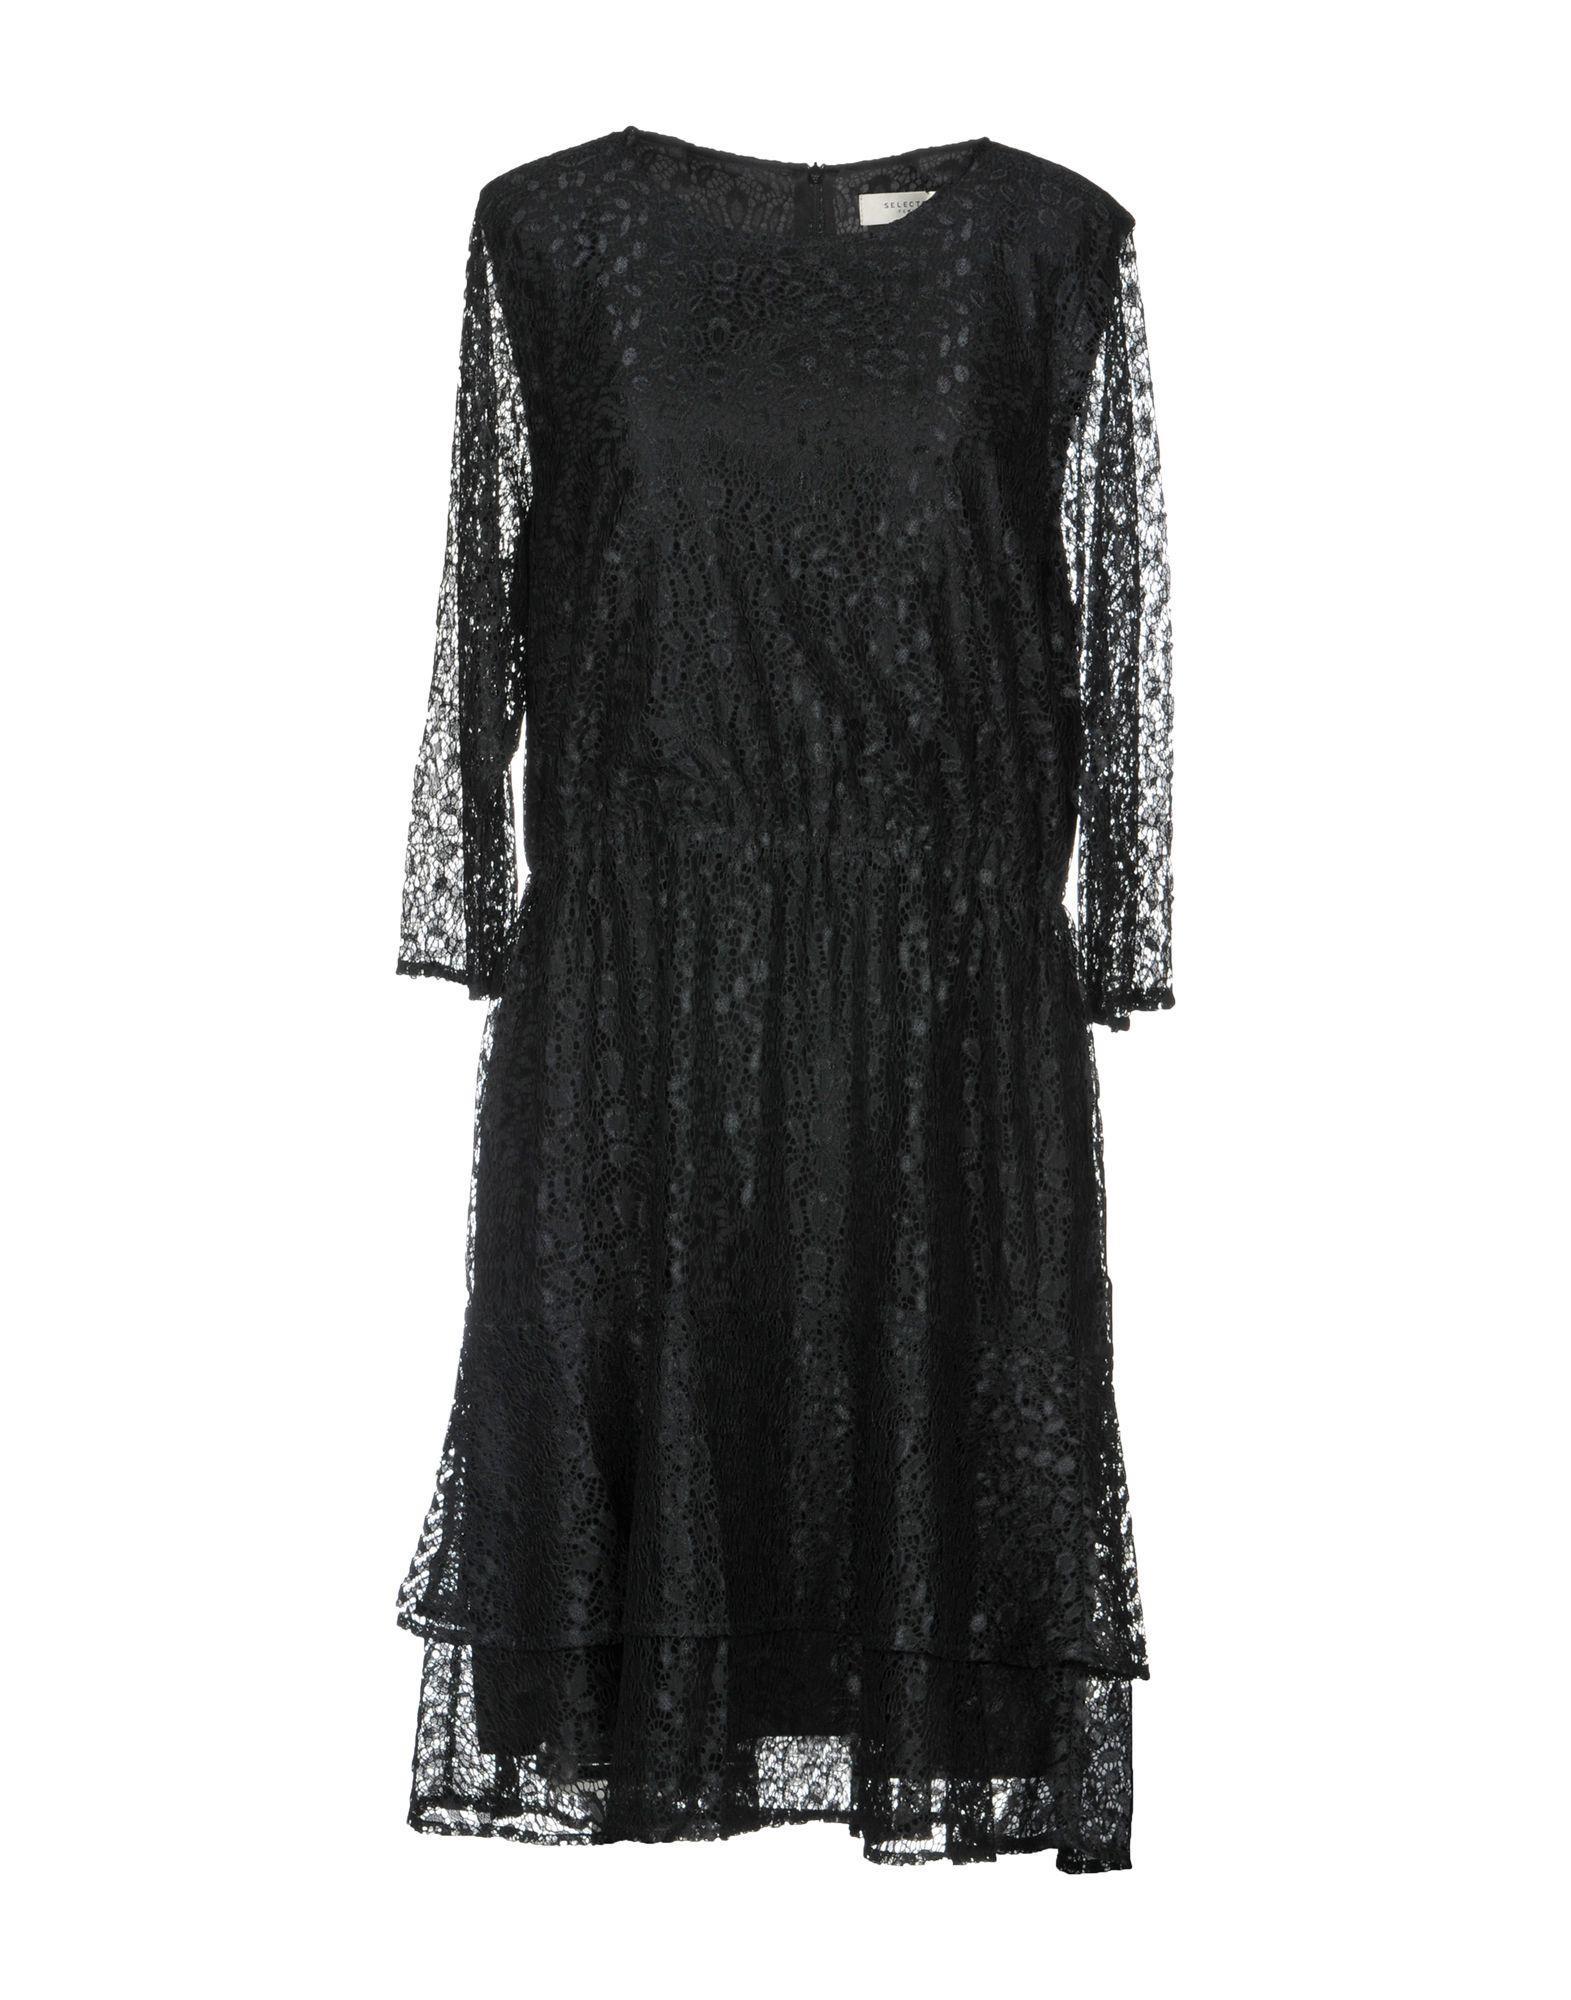 SELECTED FEMME Платье до колена